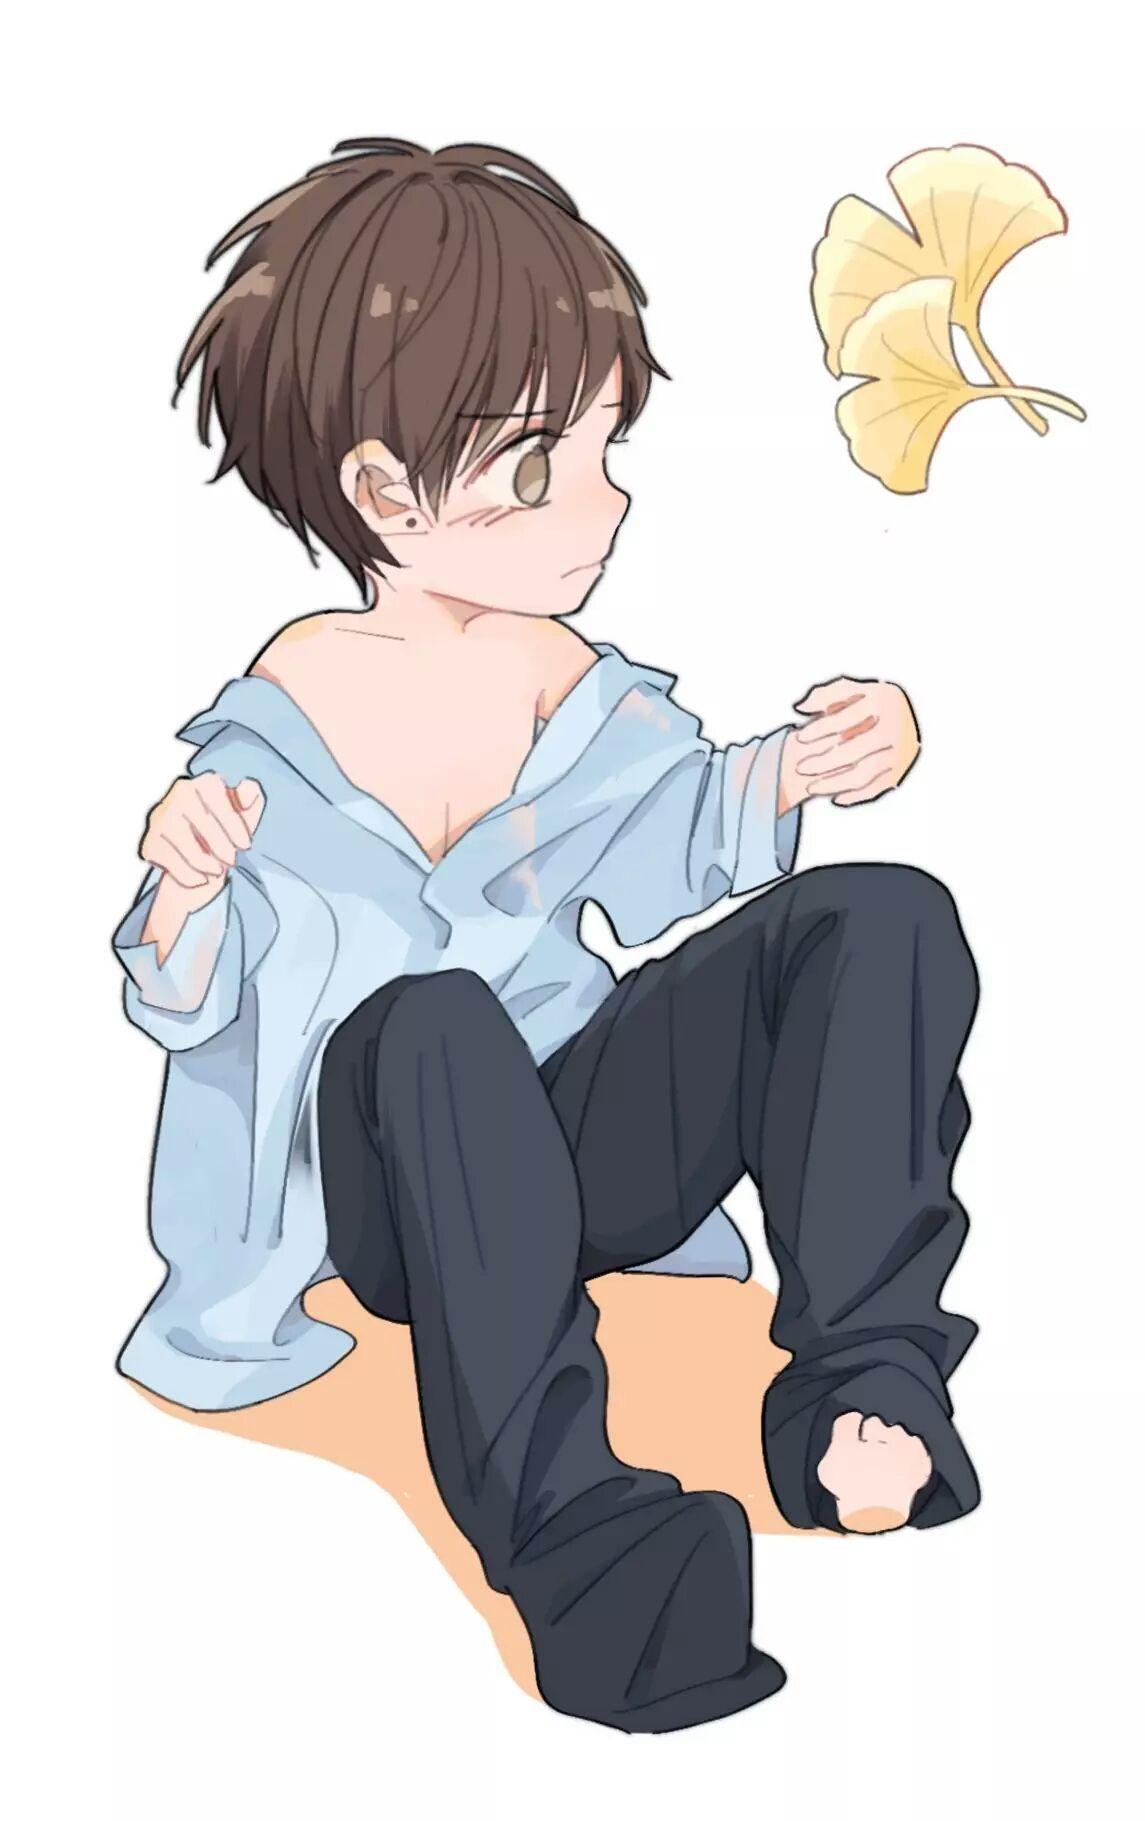 Pin by Kris★ on BaiQi♡백기♡ハク♡白起♡7/29♥︎